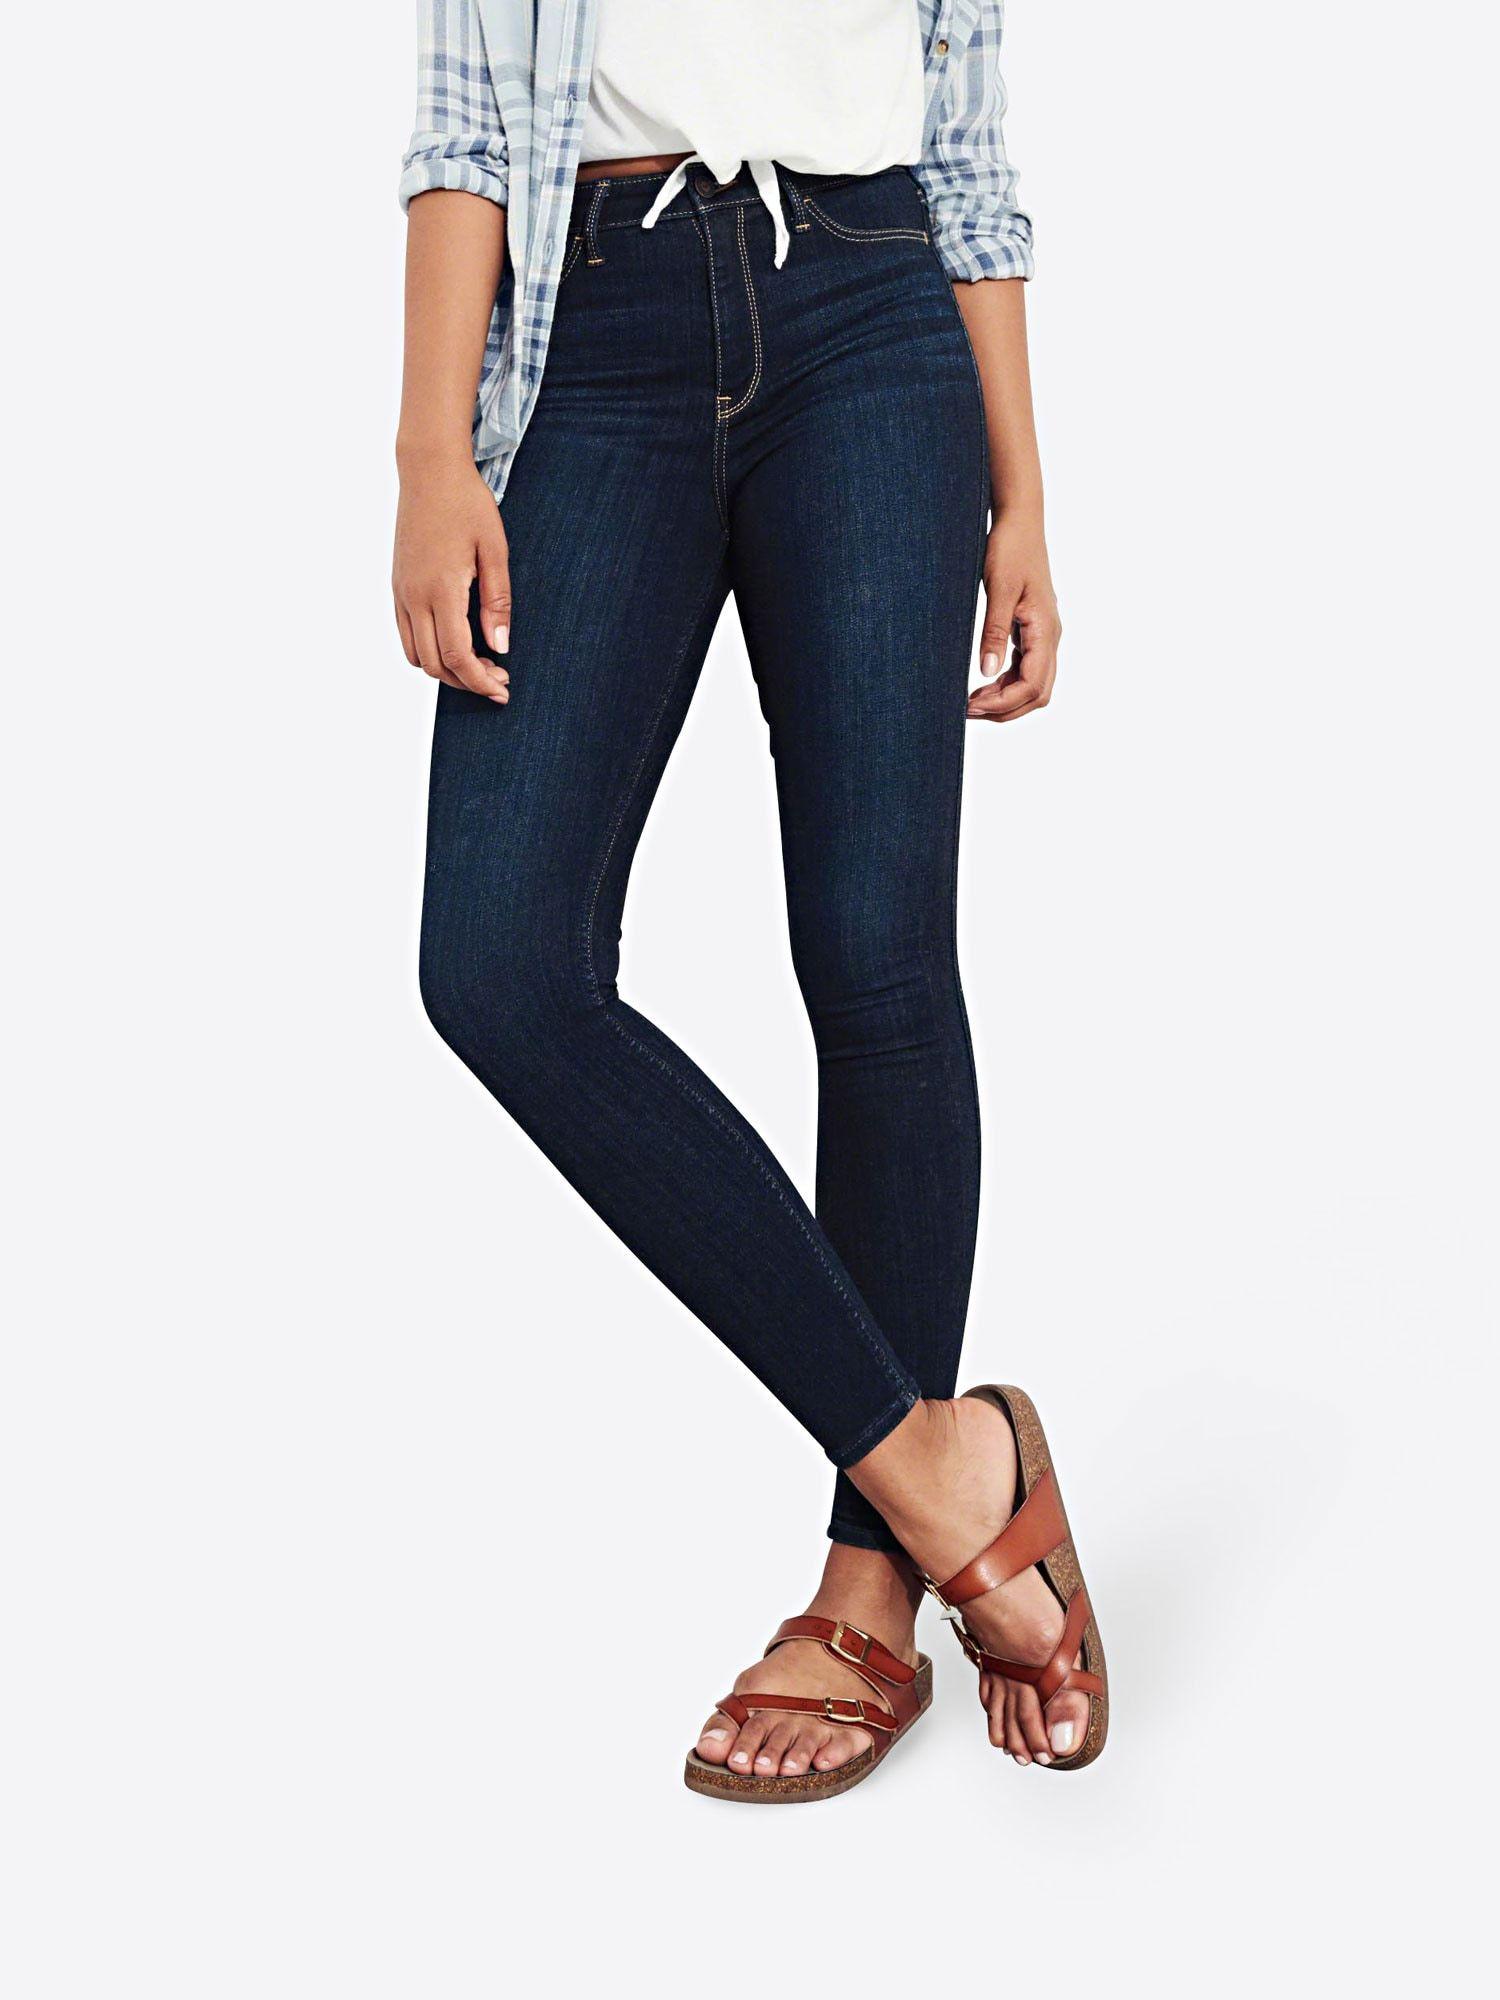 damen jeans schwarz ankle 25 hollister